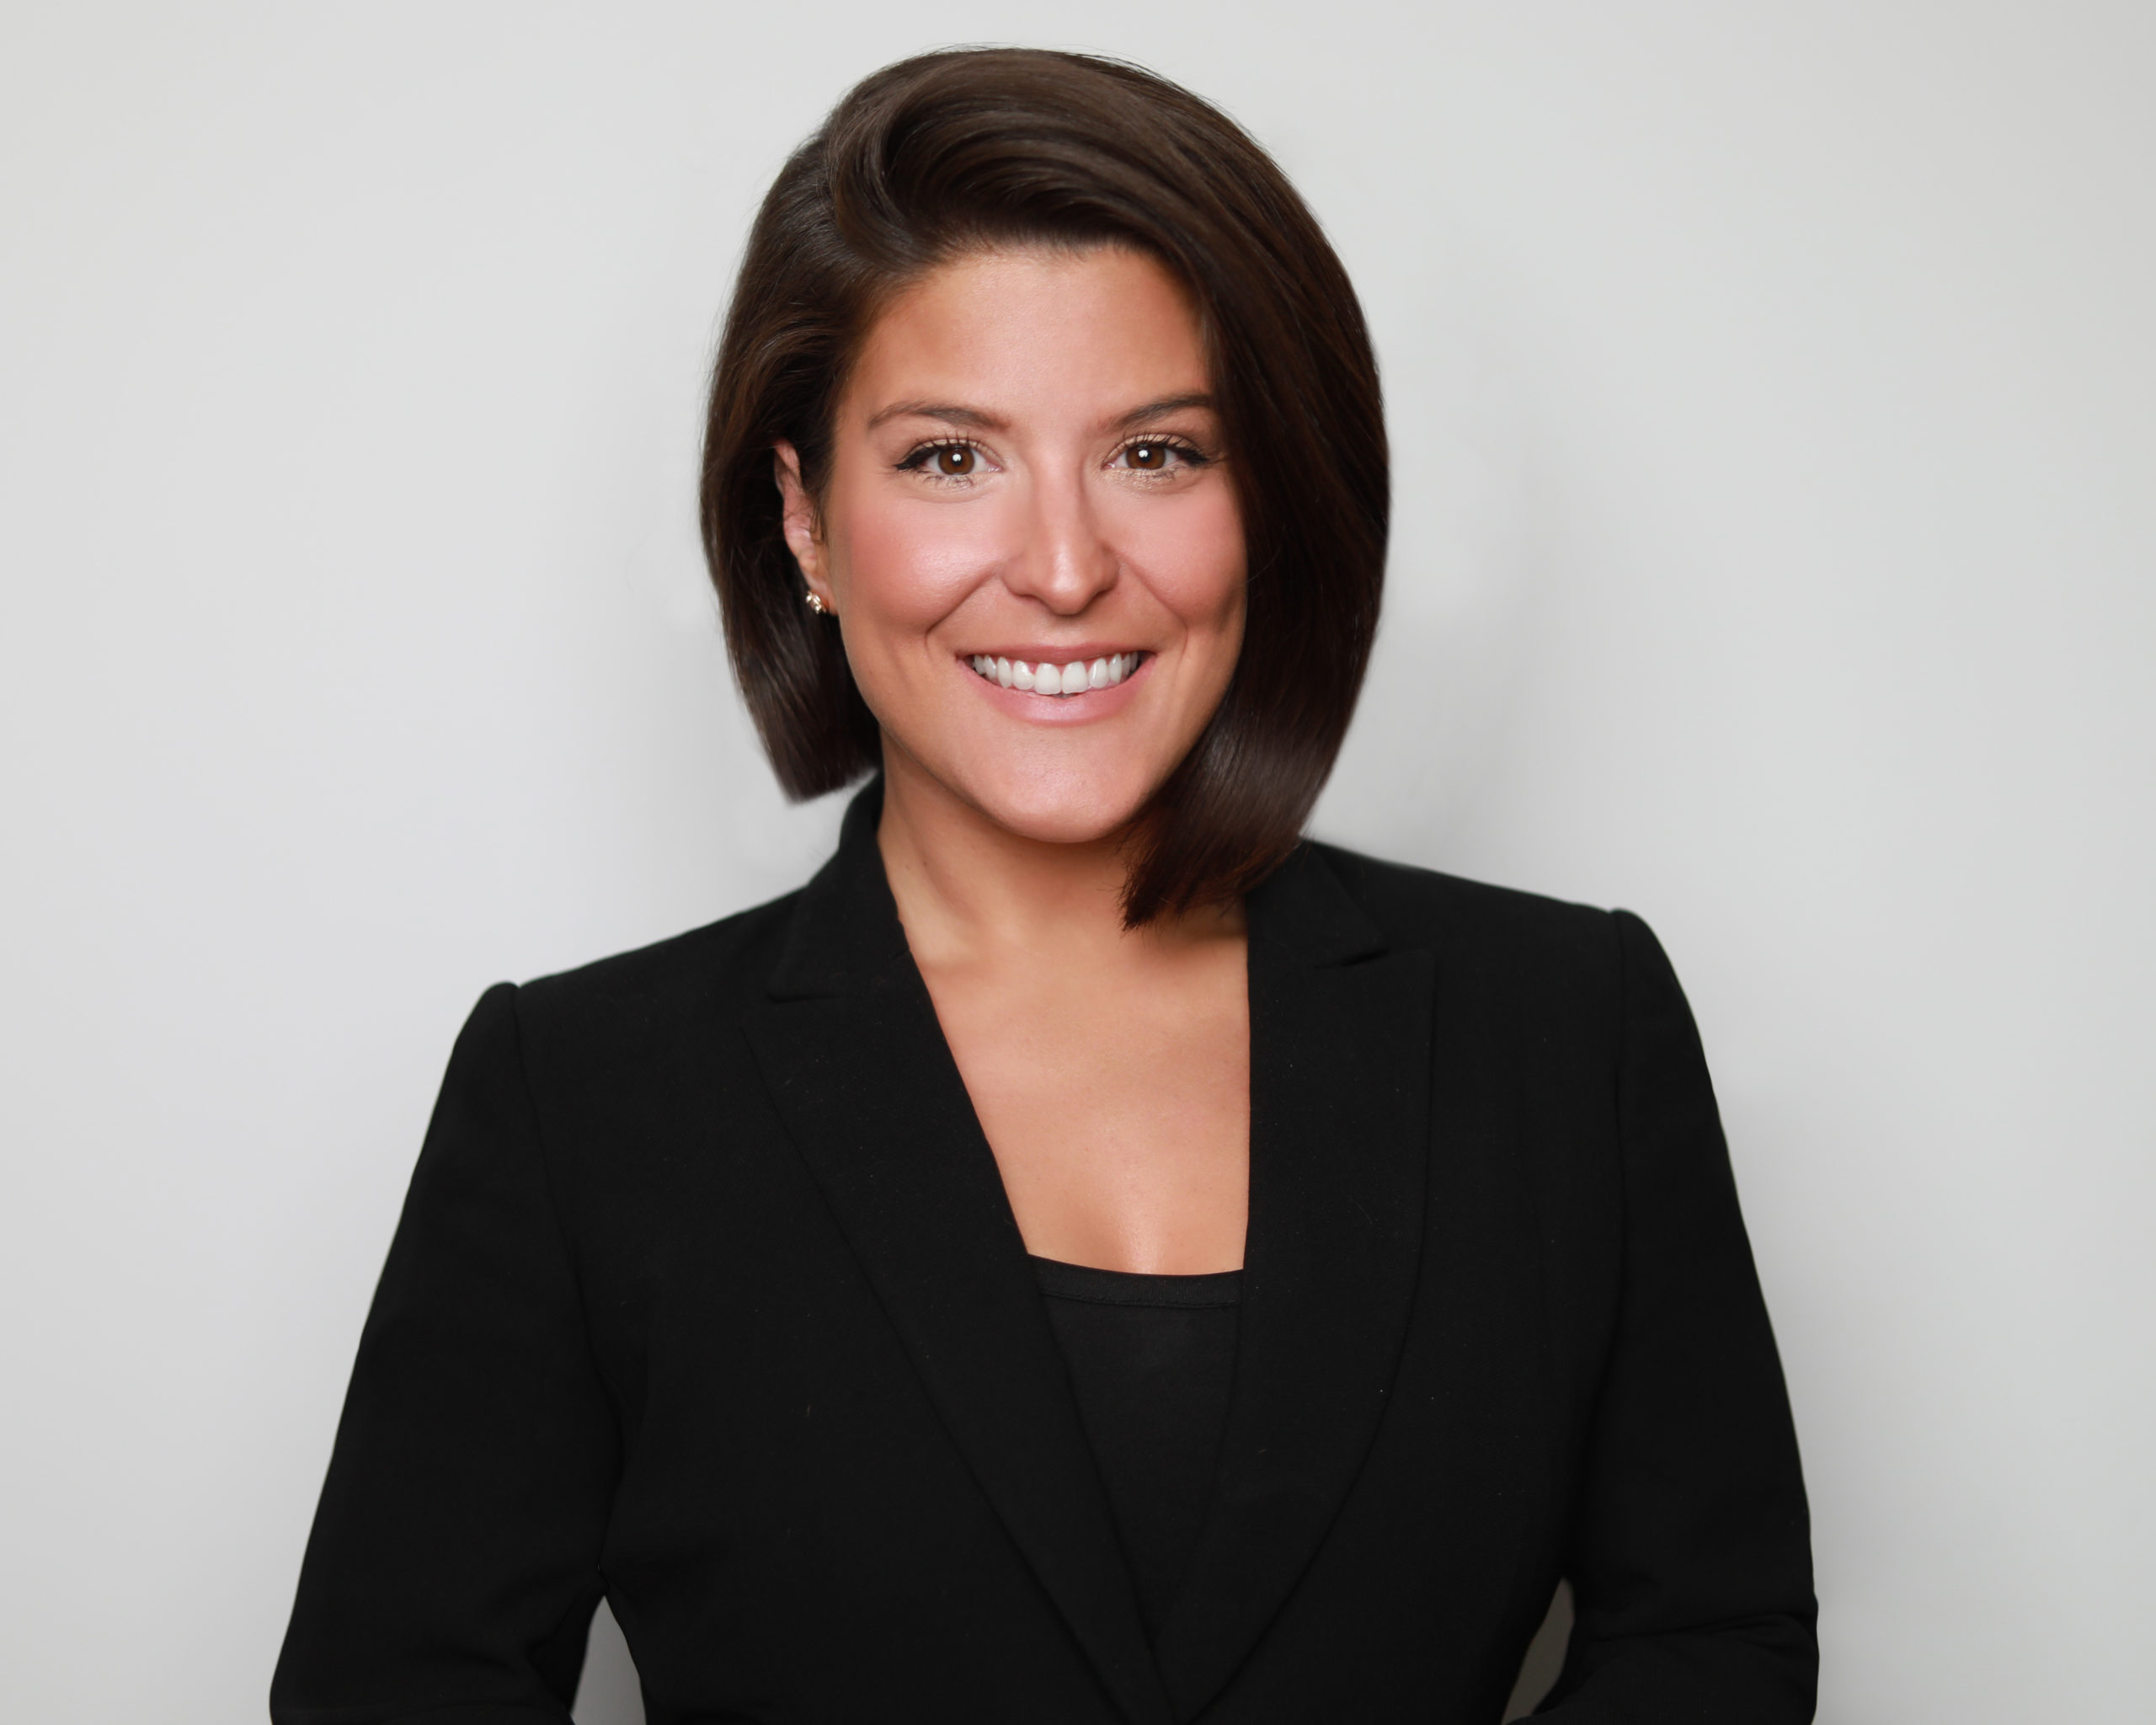 Kristen N. Sinnott